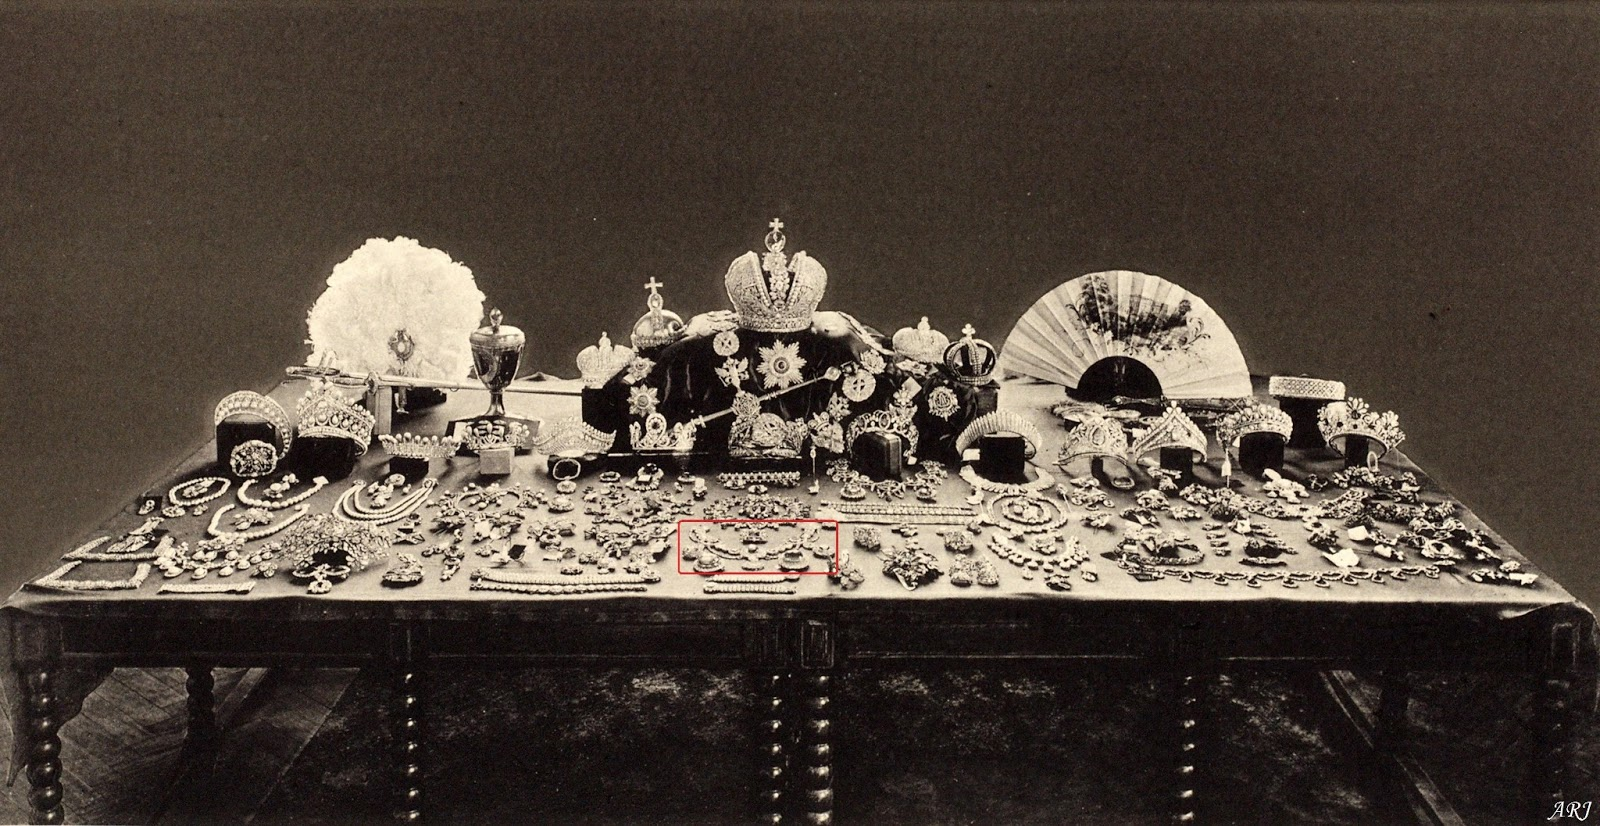 Artemisias Royal Jewels Requests Sunday Empress Maria  : russianjewel4custom bdc2bc2911796f02557d216d477e5a1902442c7c from artemisiasroyaljewels.blogspot.com size 1600 x 826 jpeg 376kB